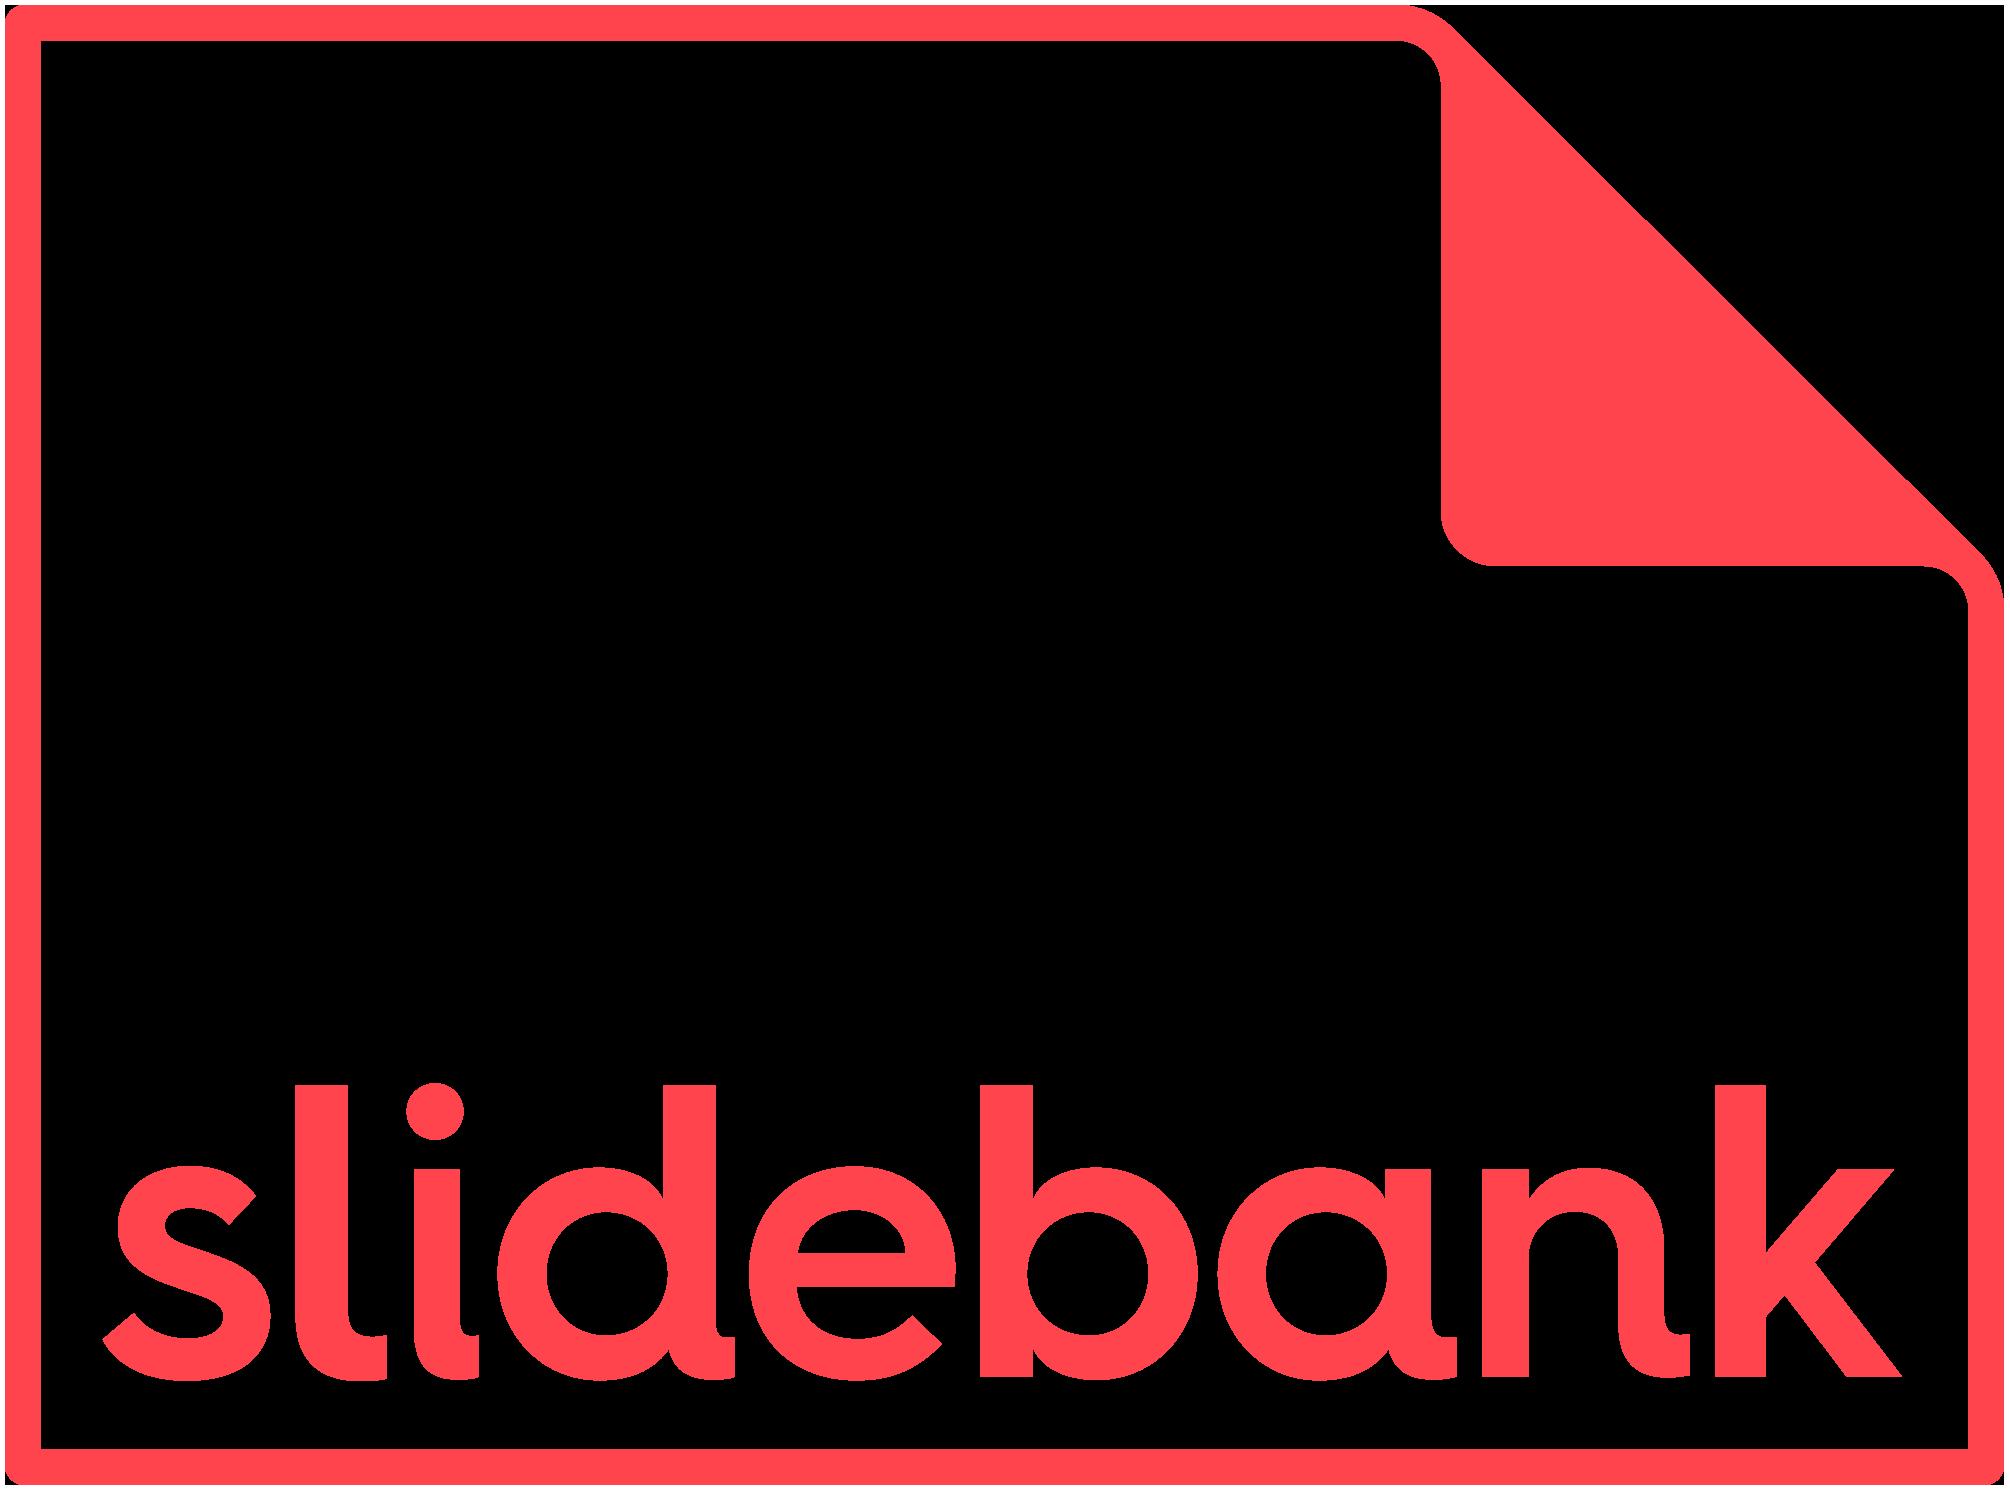 Slidebank stroked logo